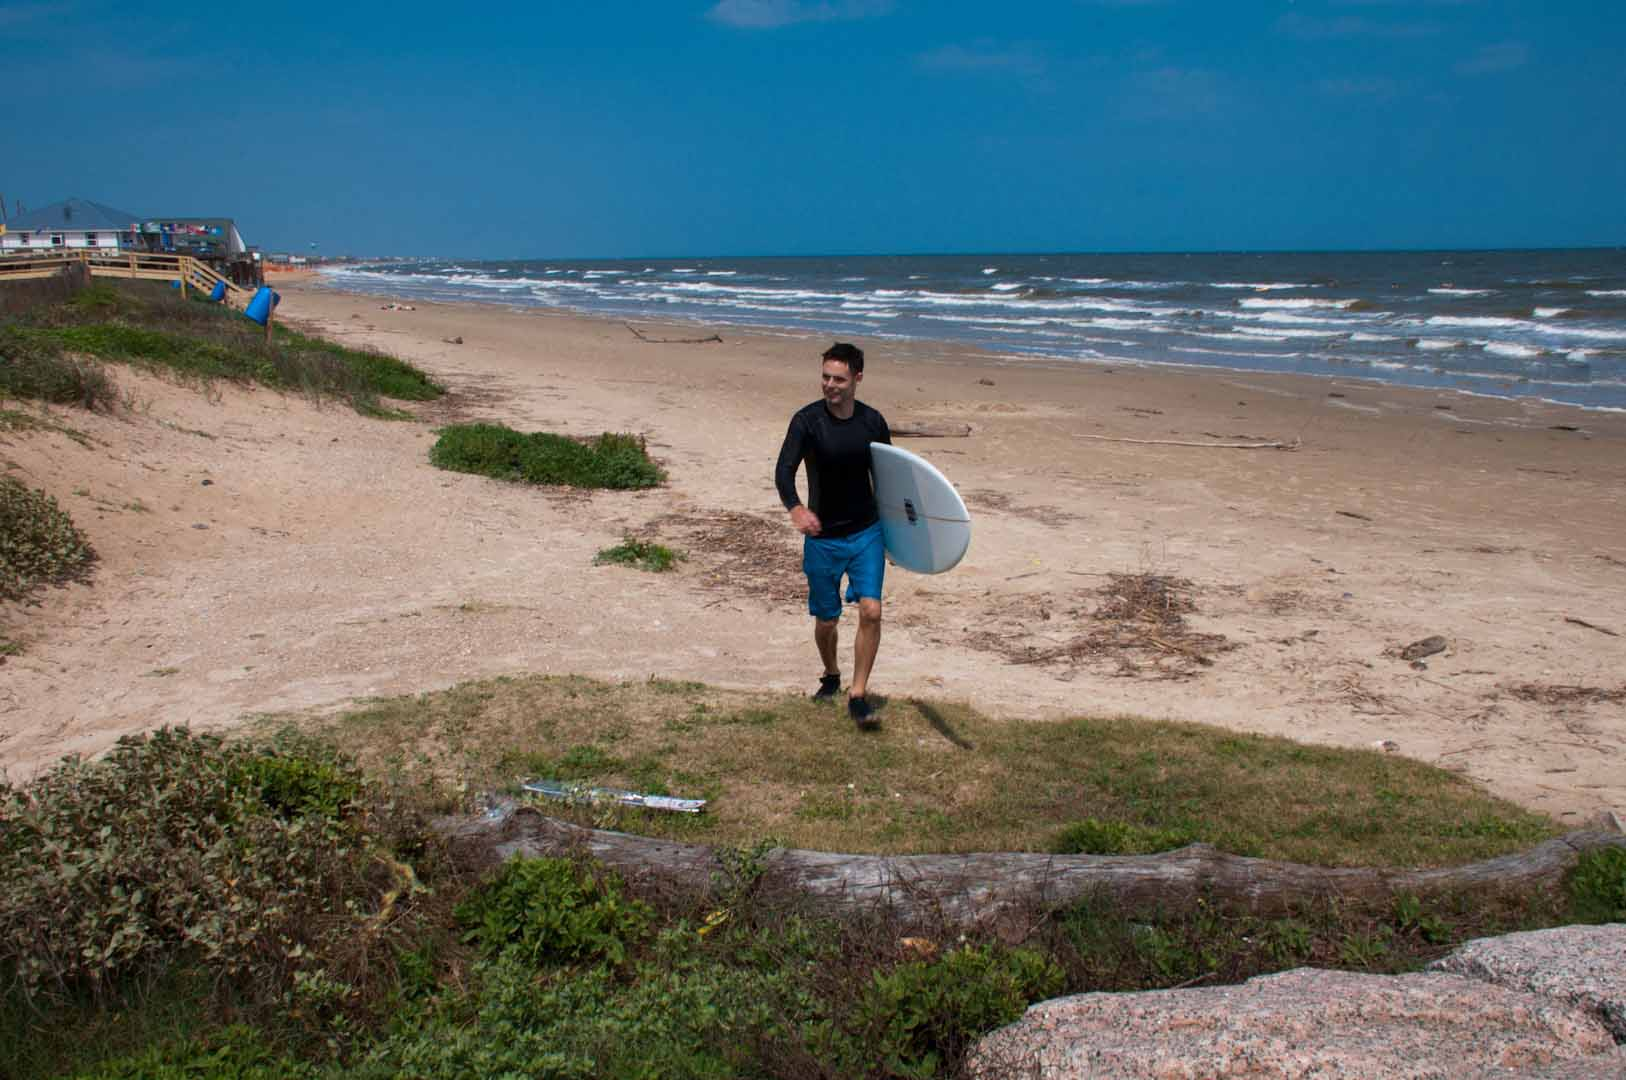 SurfsideSurfing_20150425_0131